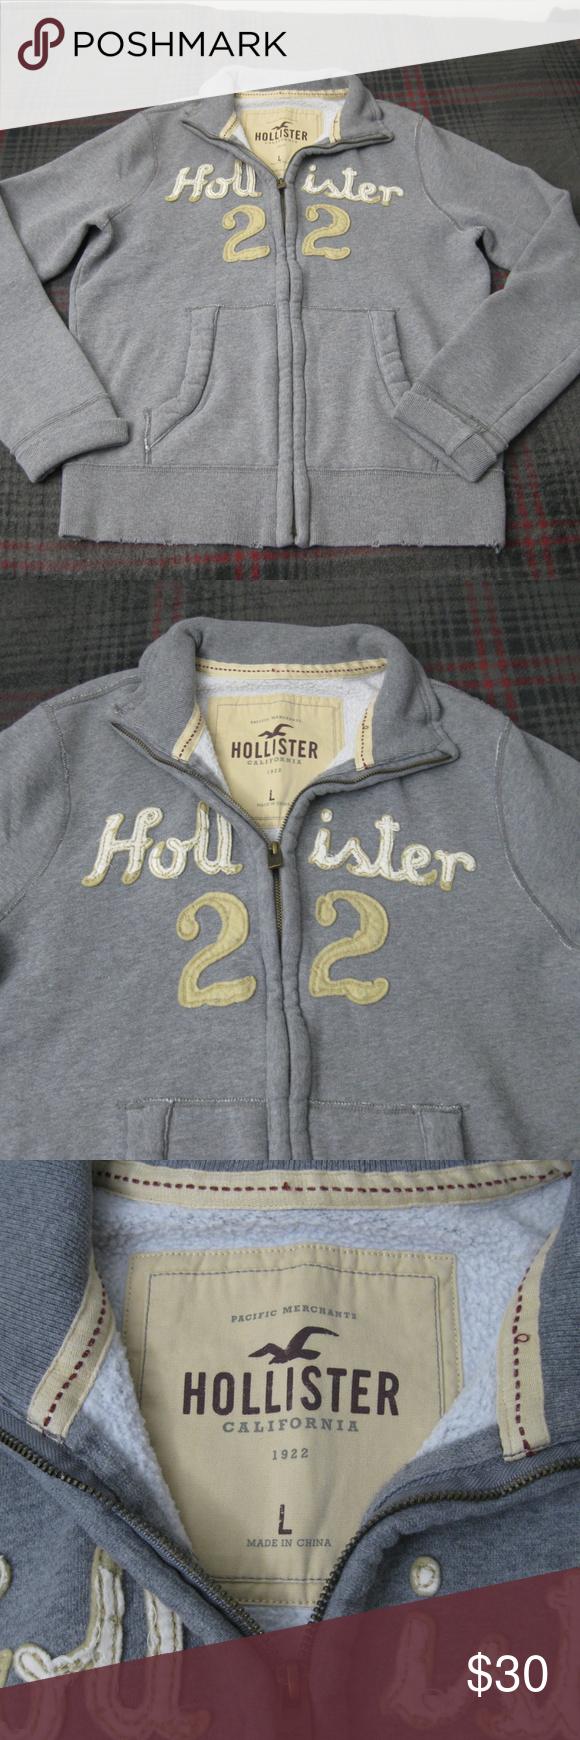 Hollister Track Jacket Men Size Large Hollister Track Jacket Size Large In Great Condition Please Check Ou Mens Jackets Track Jackets Hollister Jackets [ 1740 x 580 Pixel ]